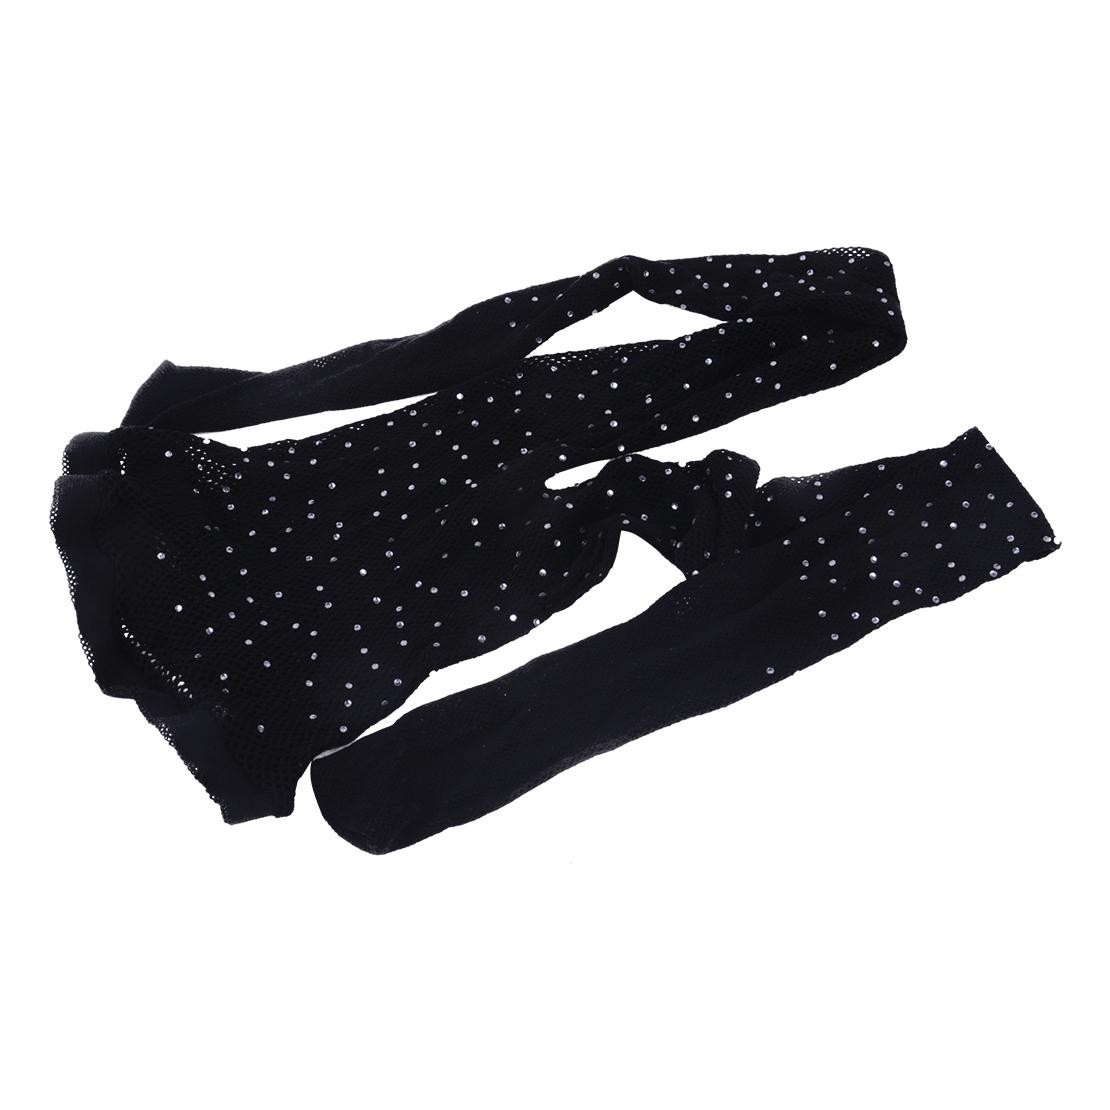 Women-Bling-Glitter-Rhinestone-Pantyhose-Fishnet-Stockings-Tights-Mesh-Socks